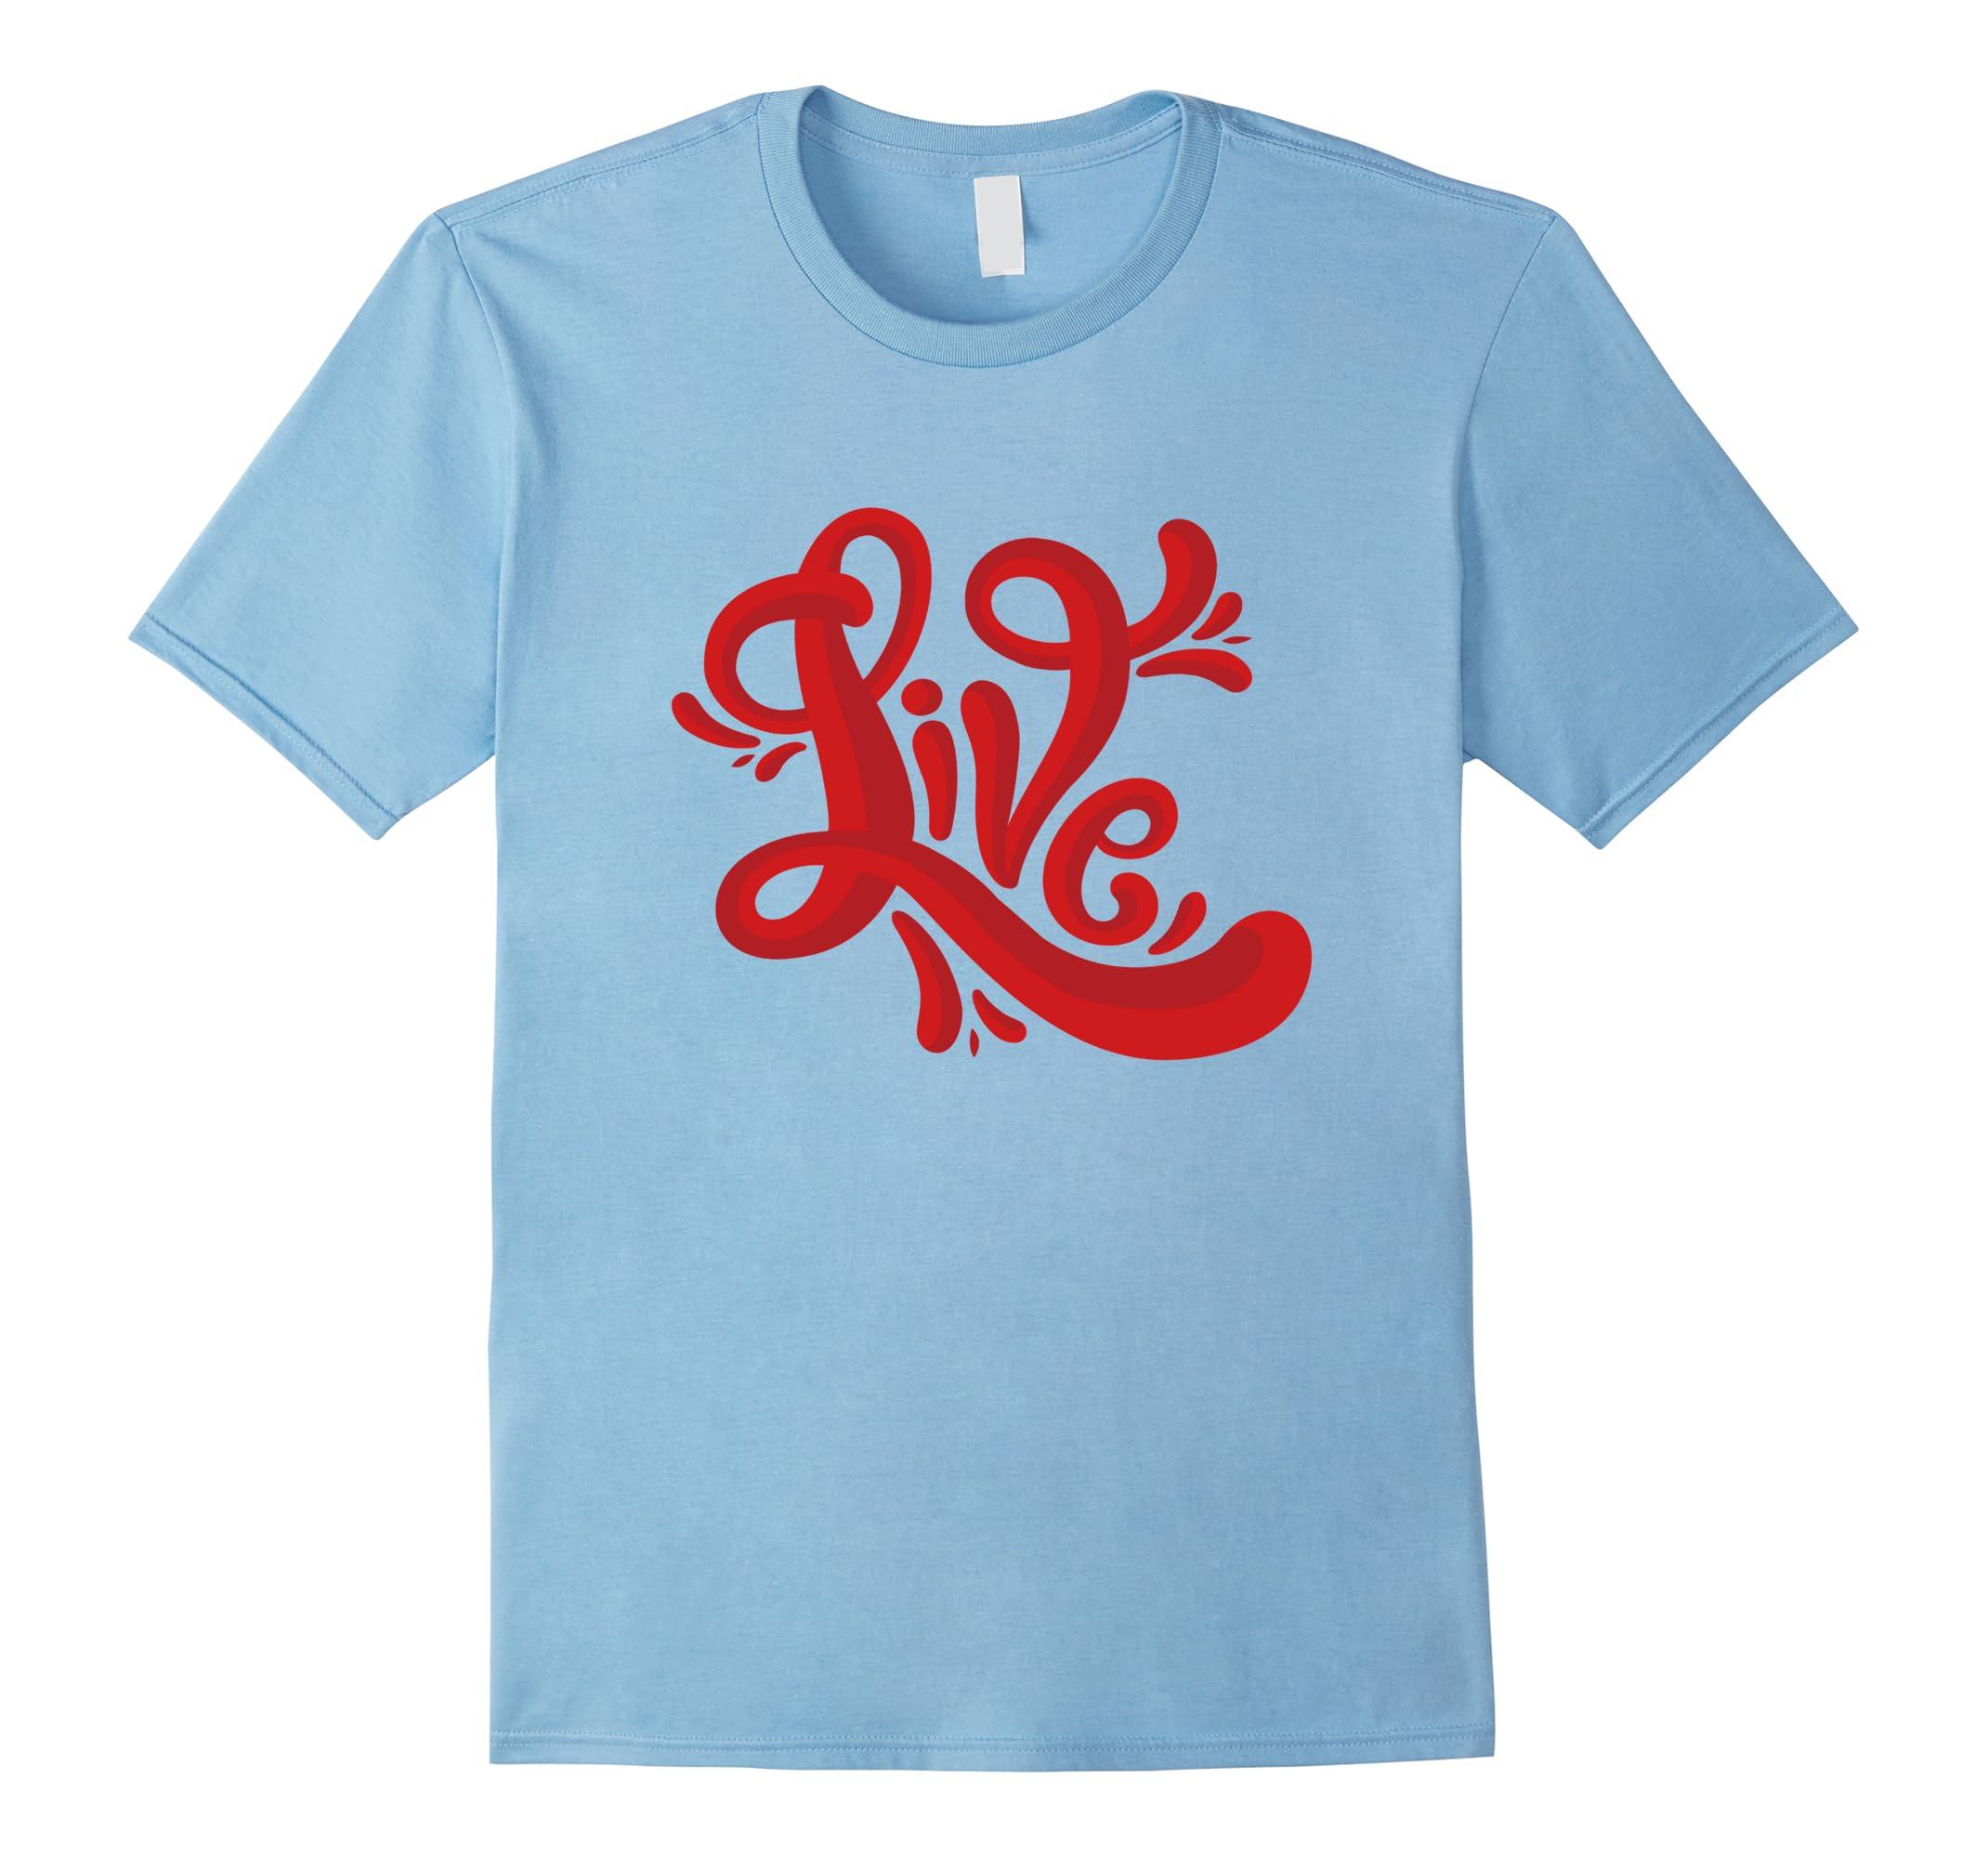 Live T-Shirt-ah my shirt one gift